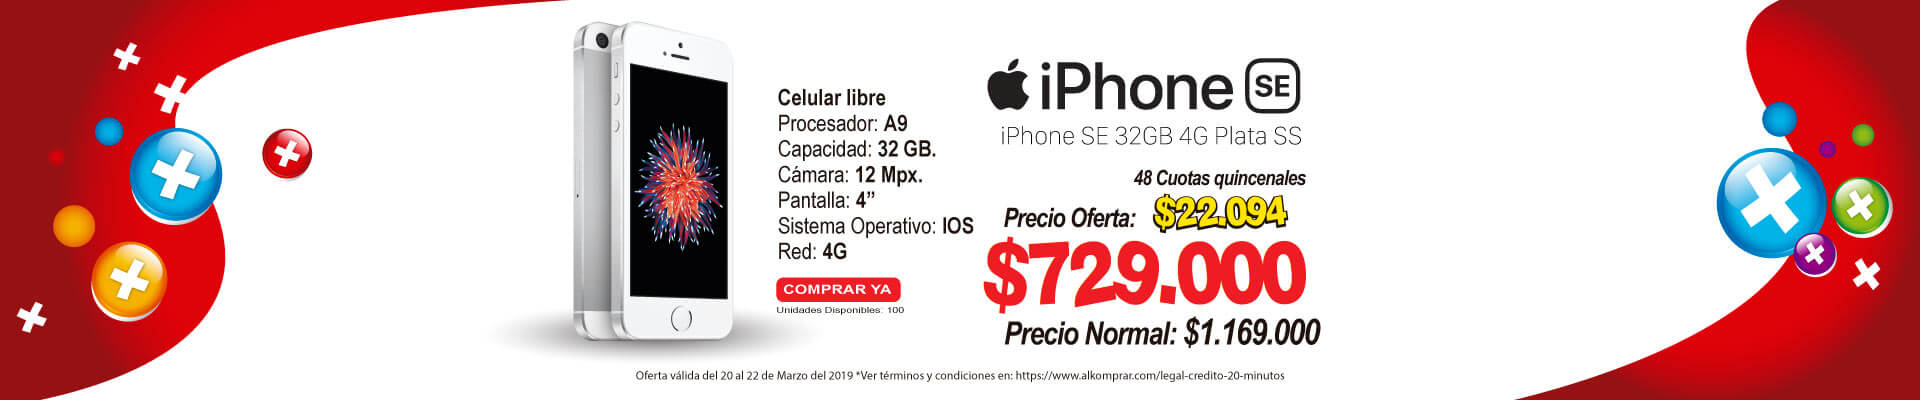 BP ALKP iPhone SE 32GB 4G Plata SS